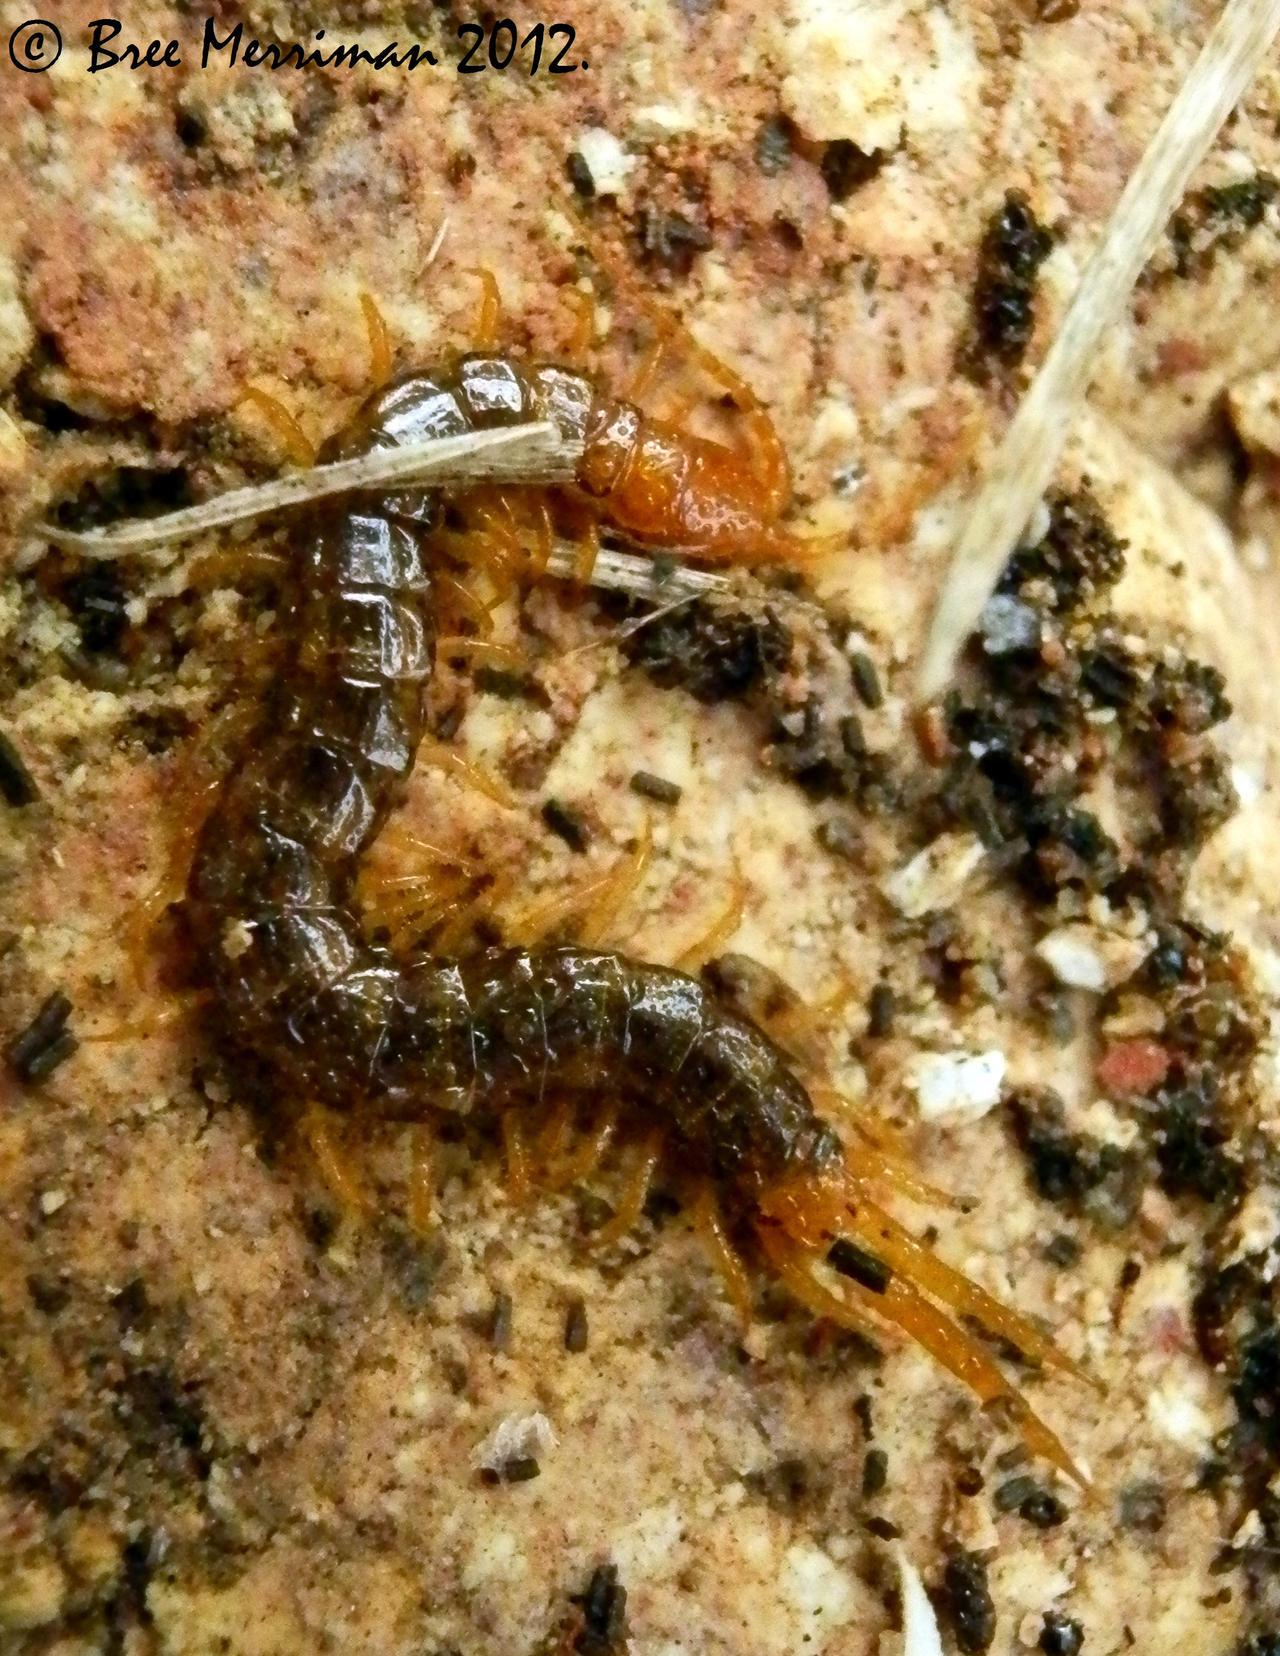 Centipede by BreeSpawn